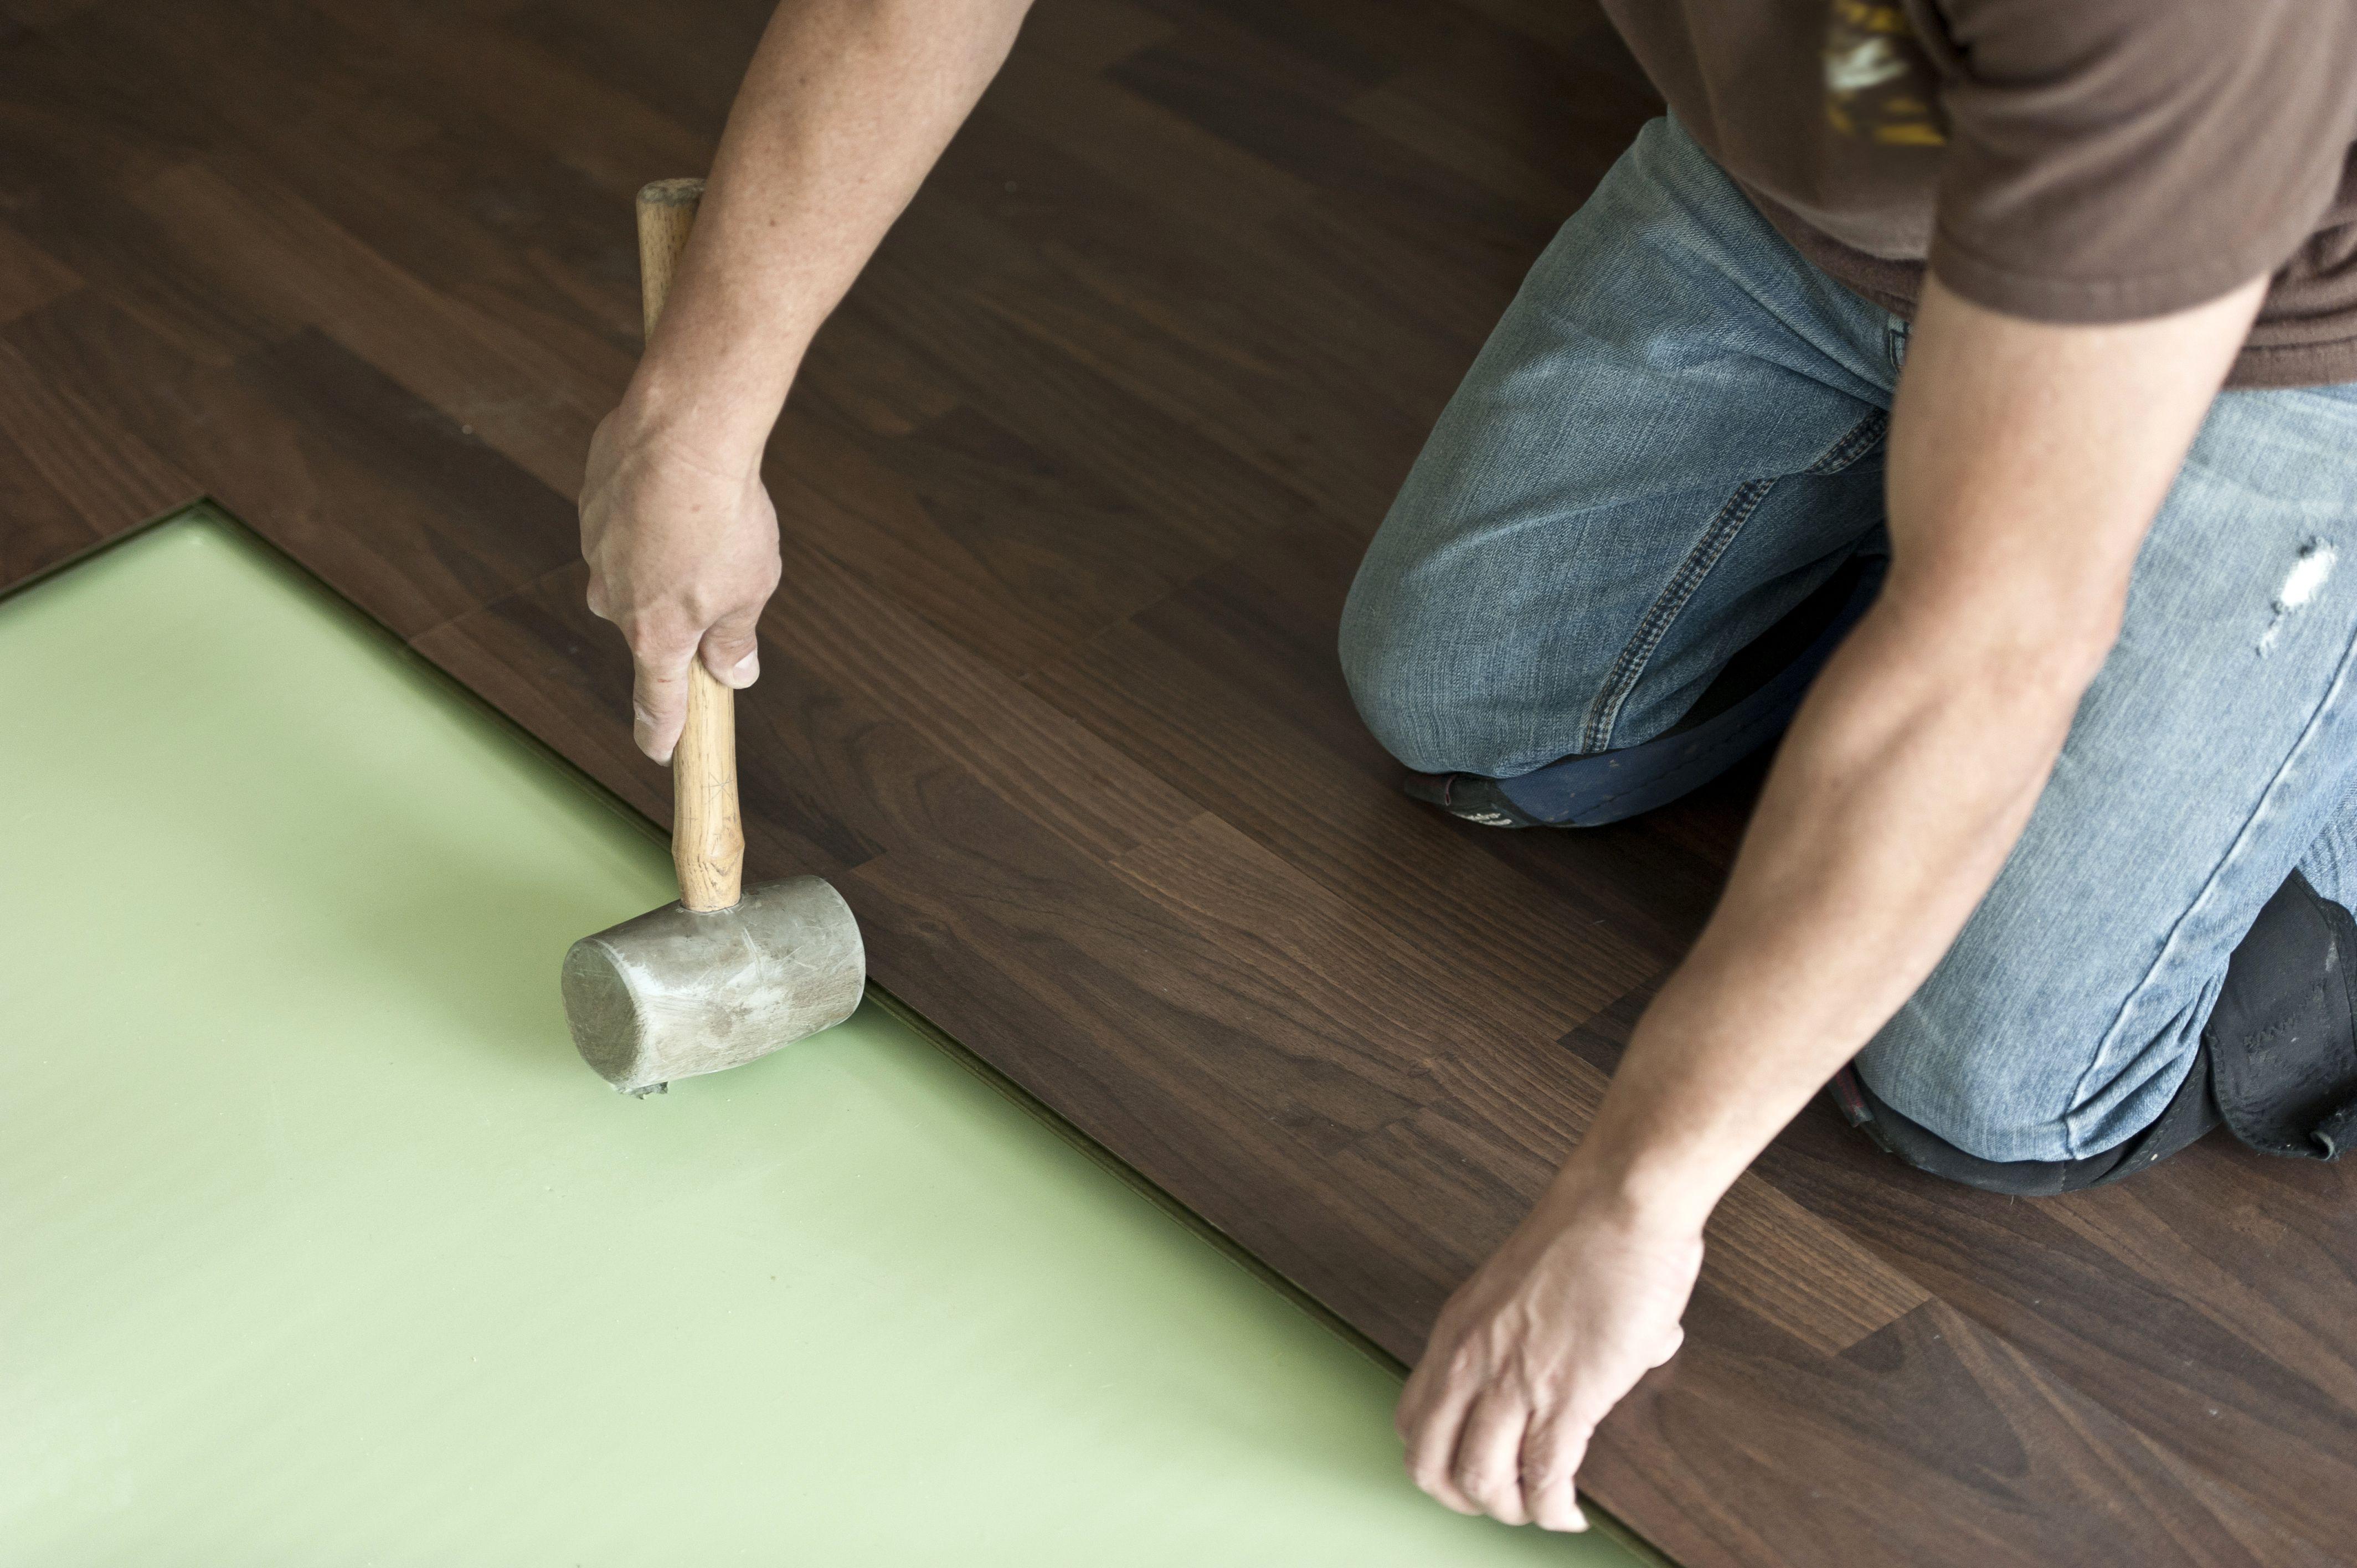 engineered hardwood flooring glue vs float of can a foam pad be use under solid hardwood flooring inside installing hardwood floor 155149312 57e967d45f9b586c35ade84a